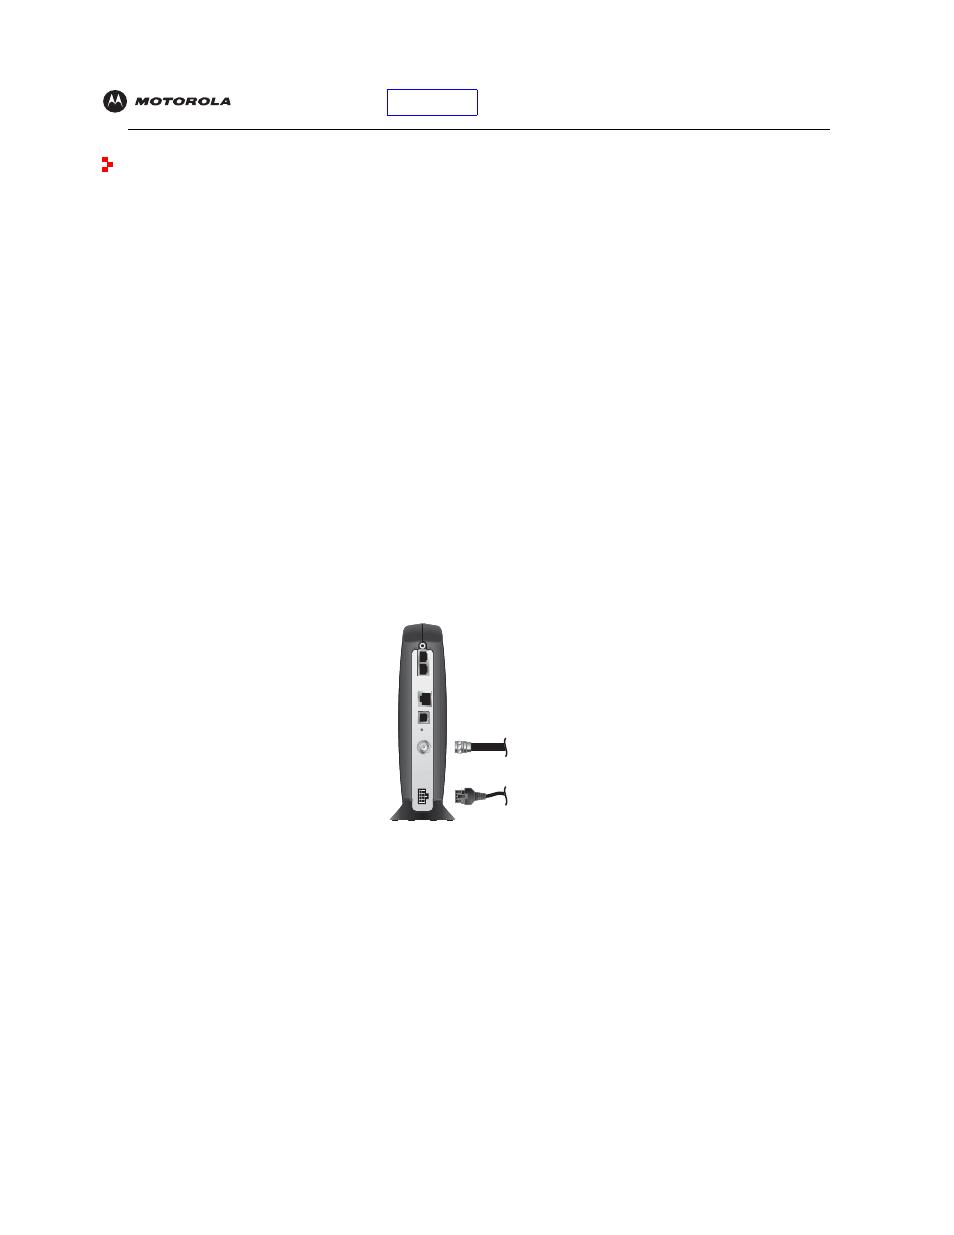 Review (mpn 60678eu for sale) 60678EU Modem model Data Cable